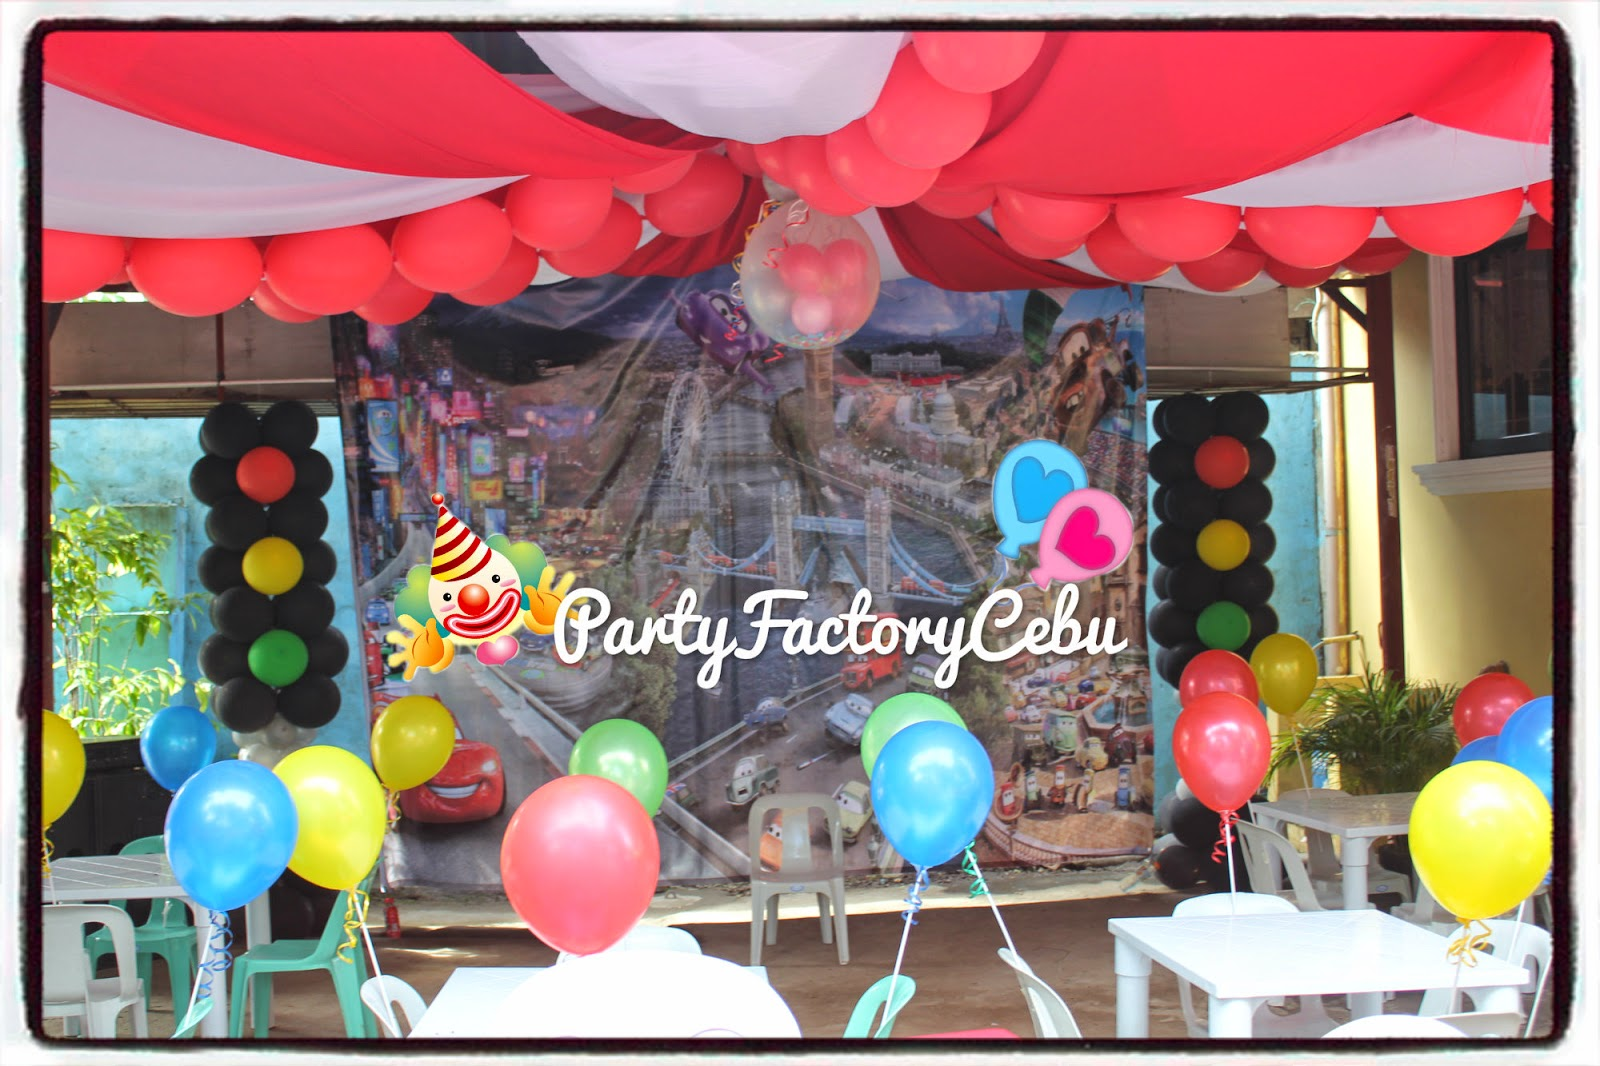 Welcome To Partyfactory Cebu Syc Kelvin S 2nd Birthday Bash